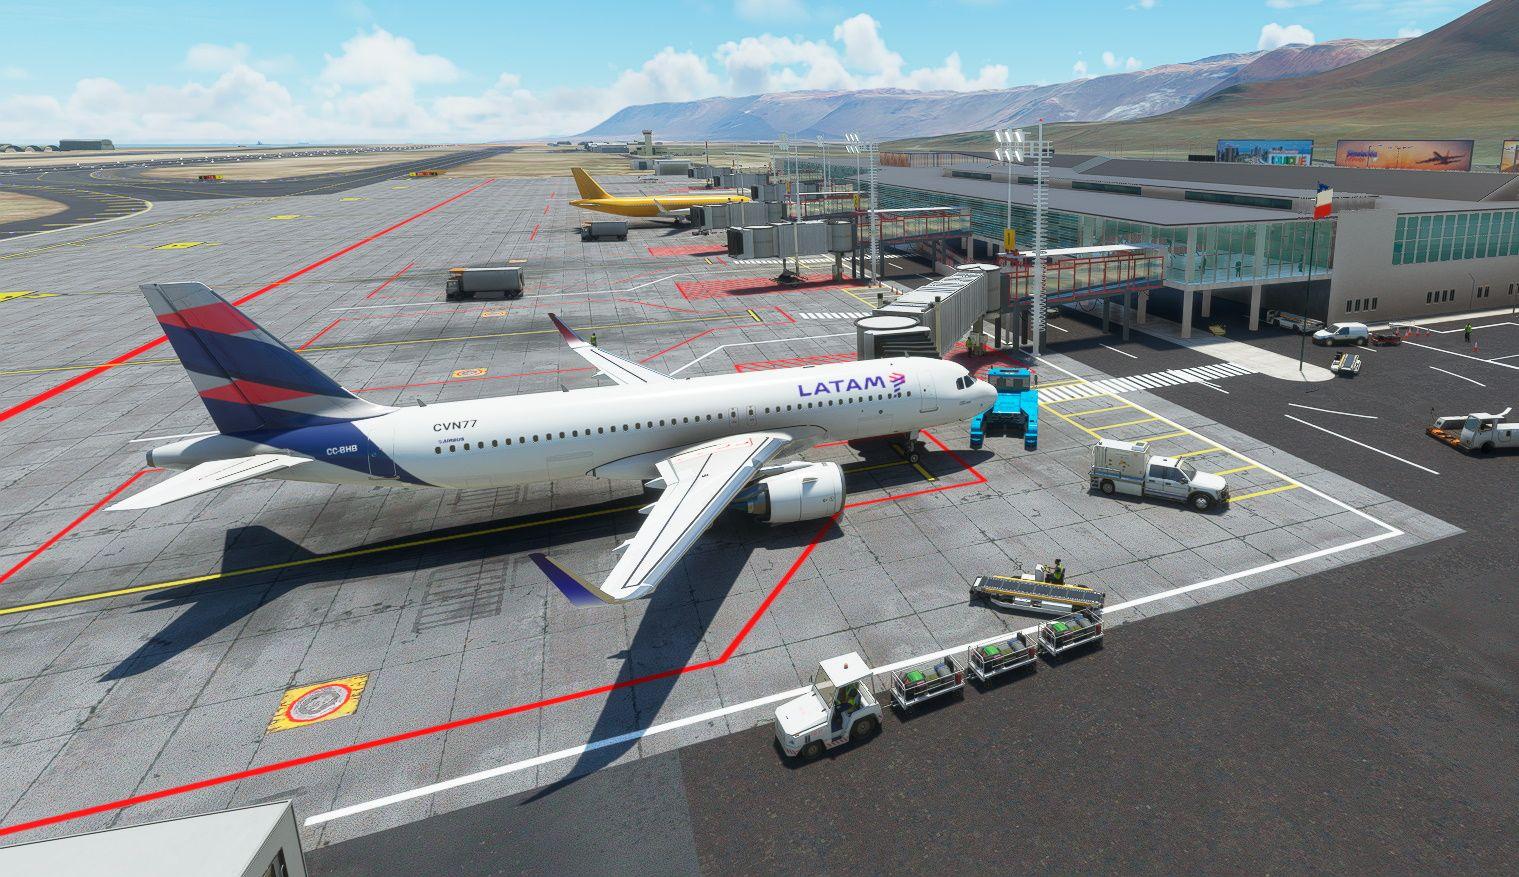 MSFS SCDA Diego Aracena International Airport